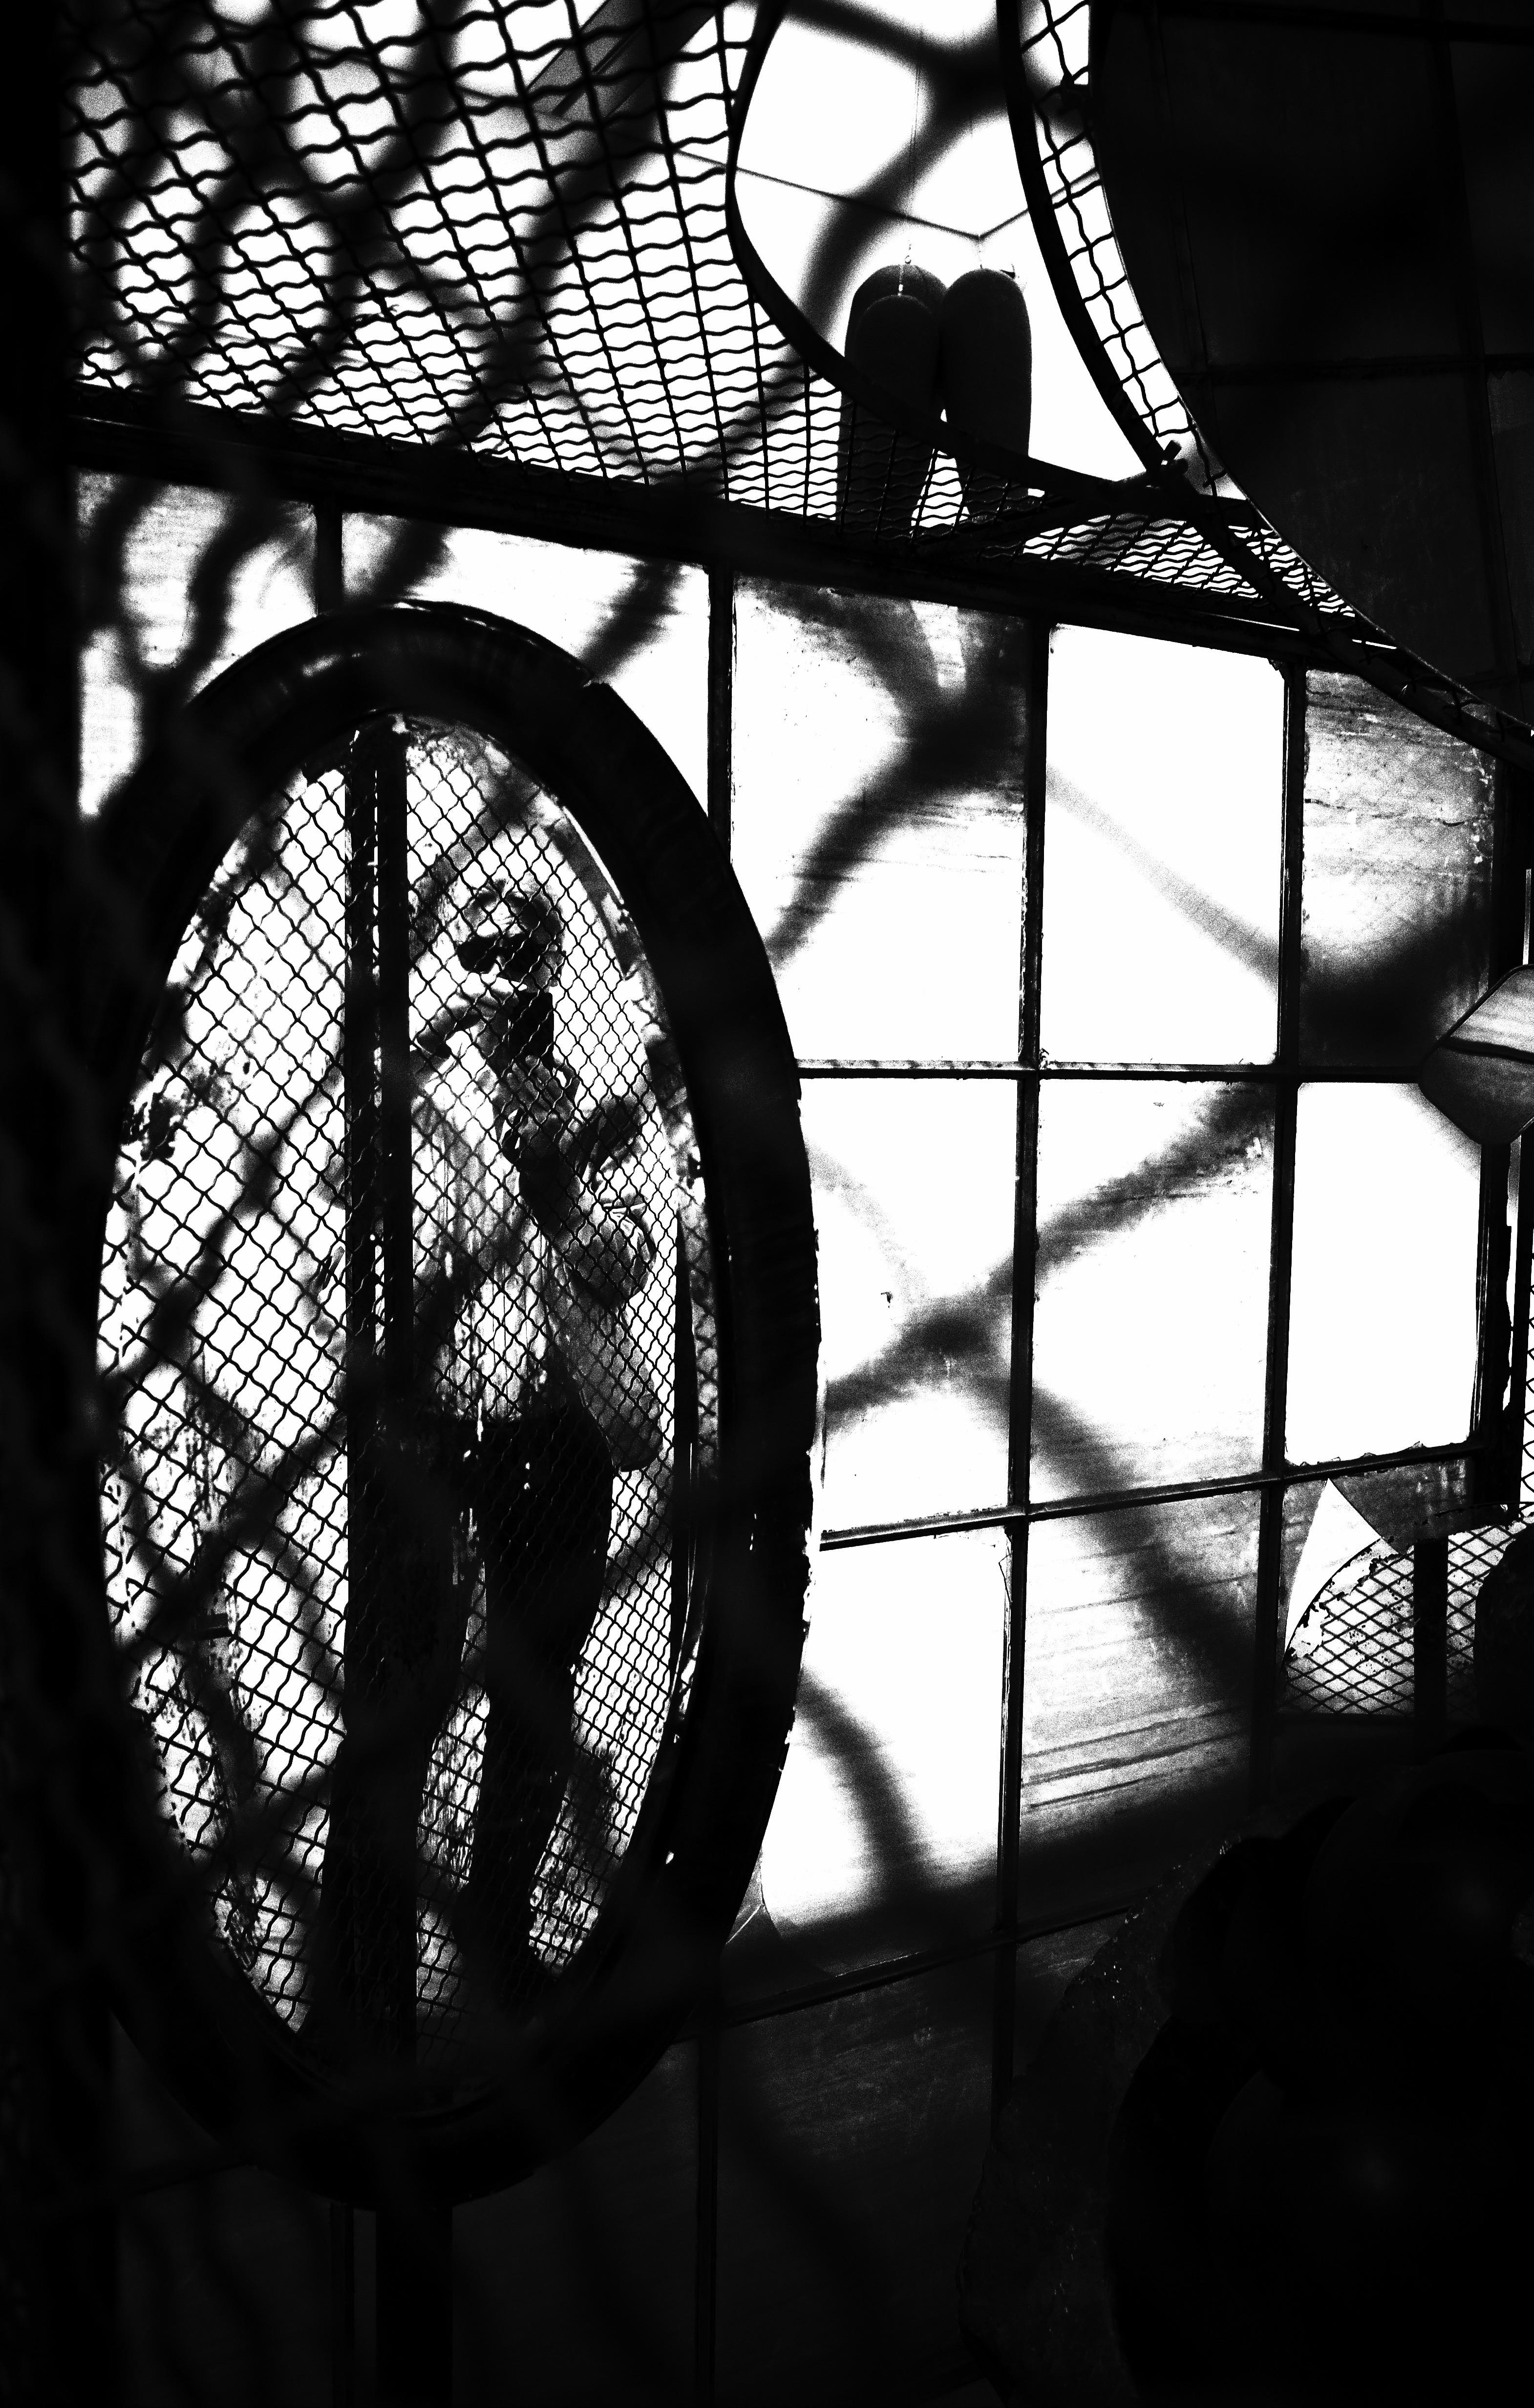 Self-Portrait, Switch House, London